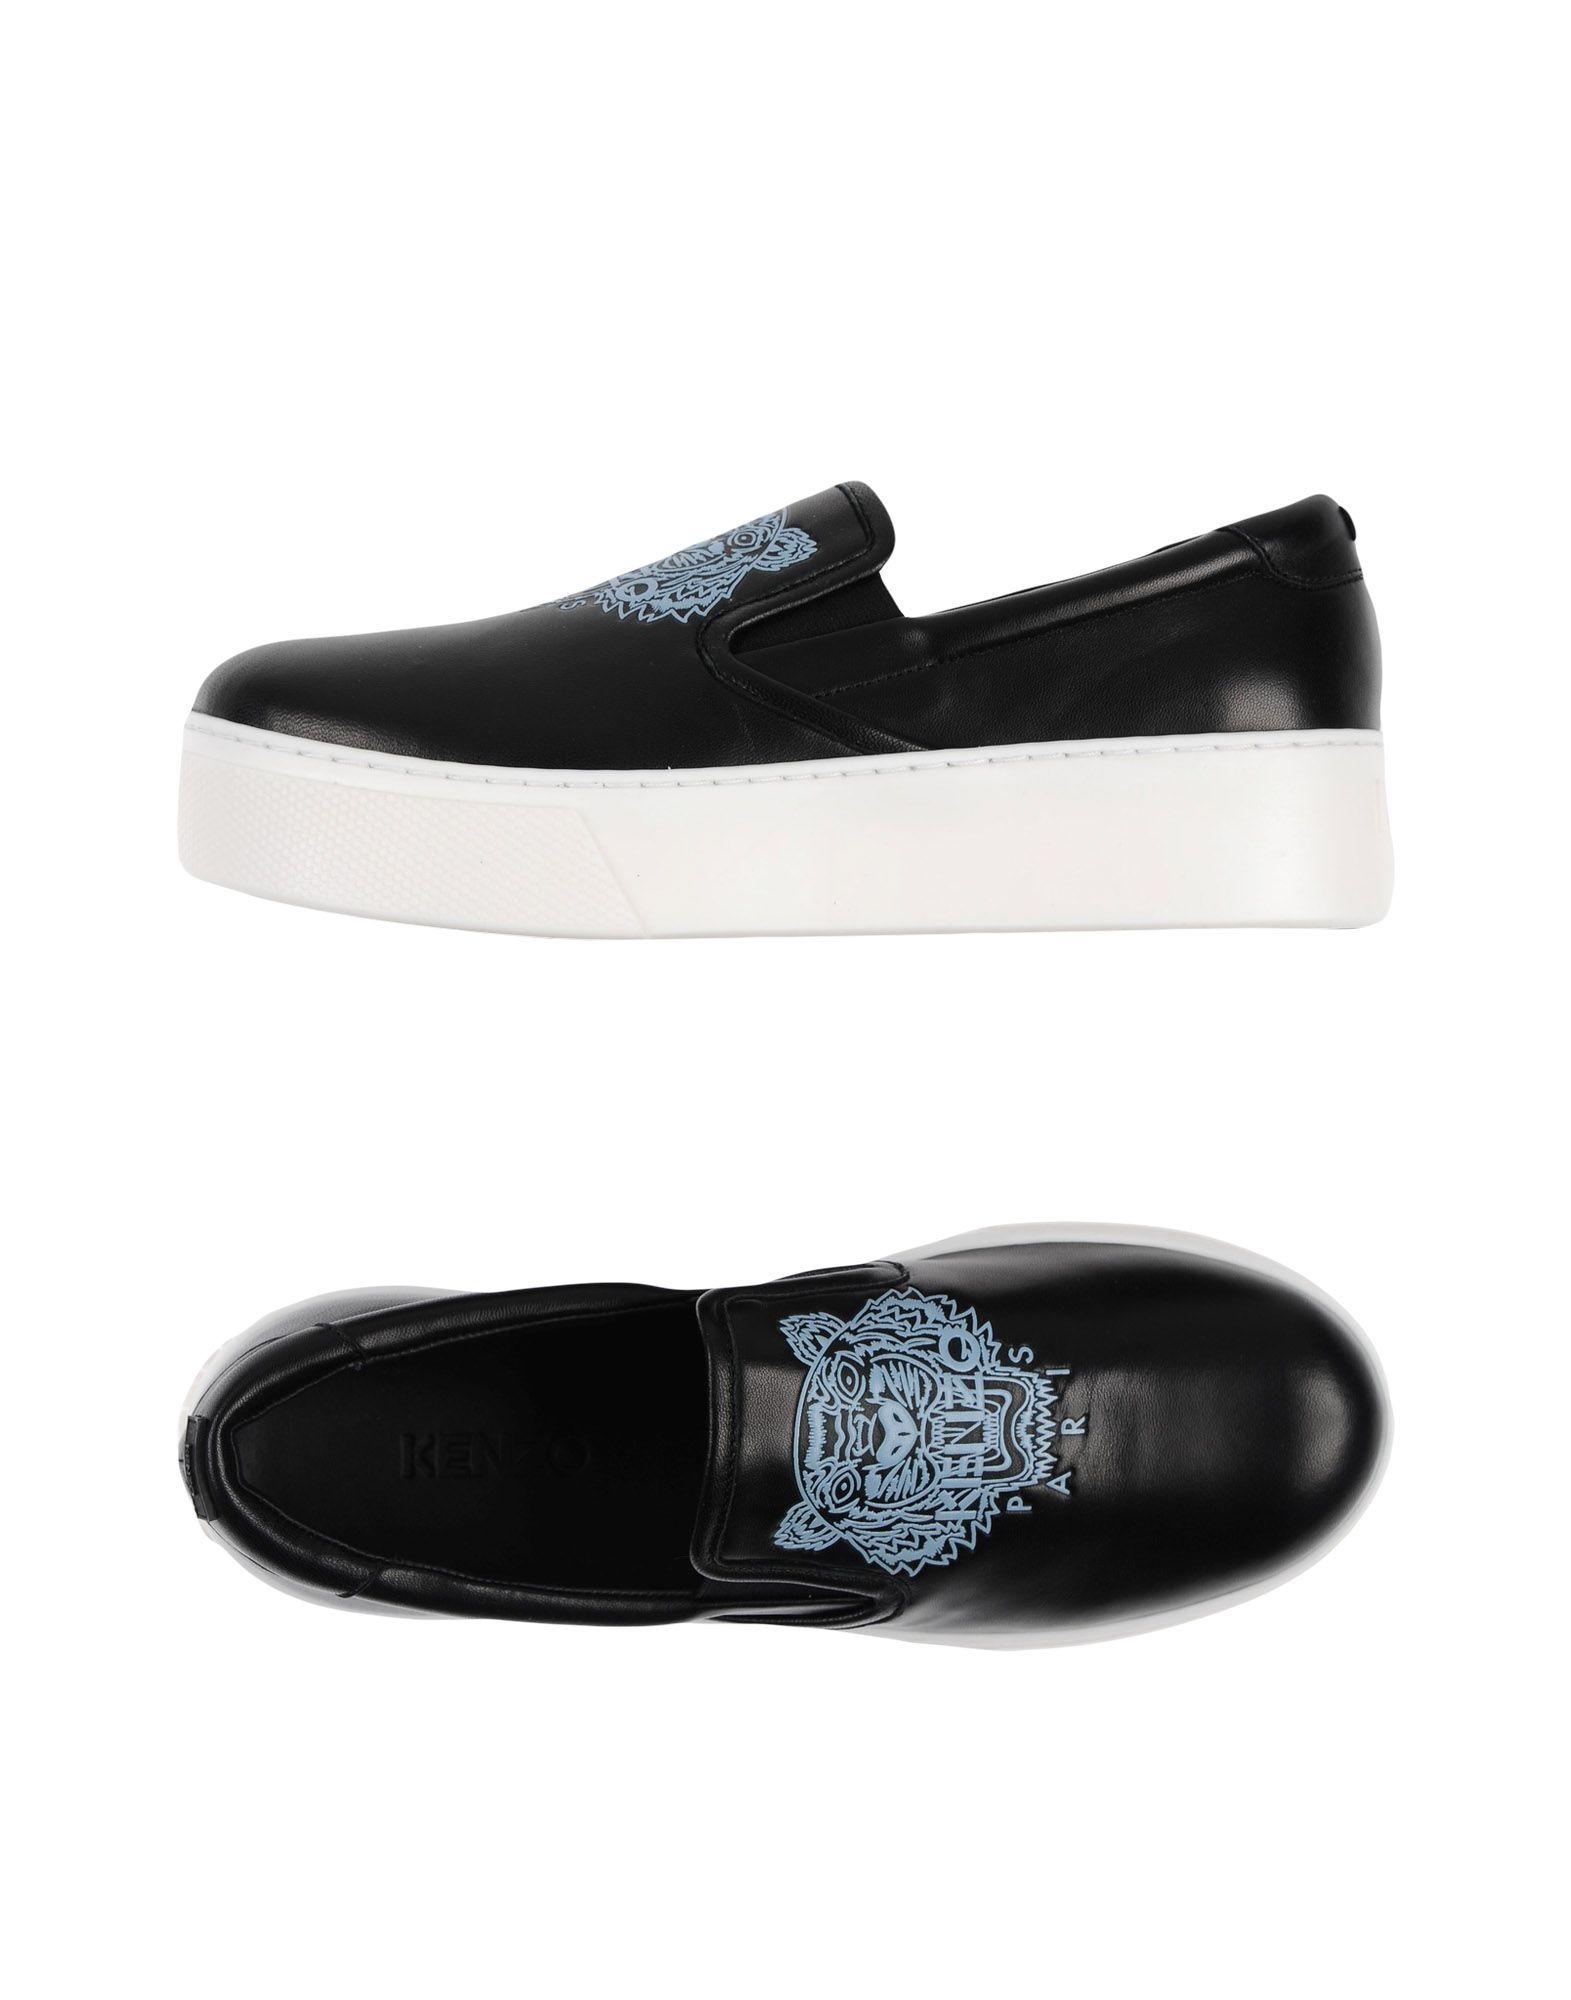 Sneakers Kenzo Donna - Acquista online su